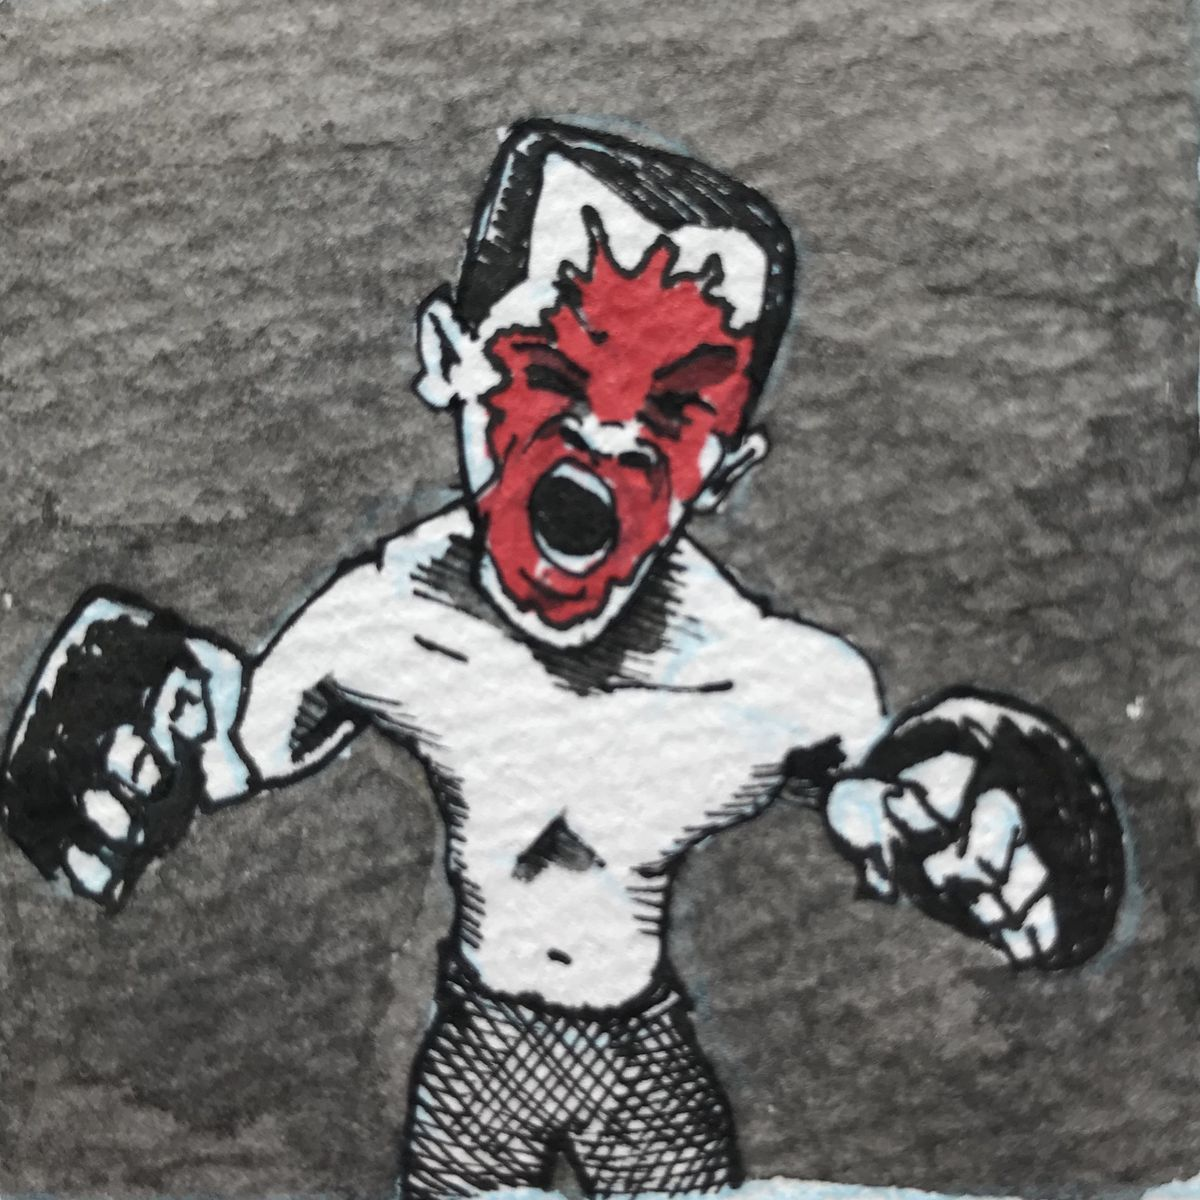 Chris Rini, MMA Squared, Gorey MMA, Conor McGregor, Nate Diaz, UFC 196, MMA Champ, BMF Title, BMF MMA, Edward Gorey Albhabet,